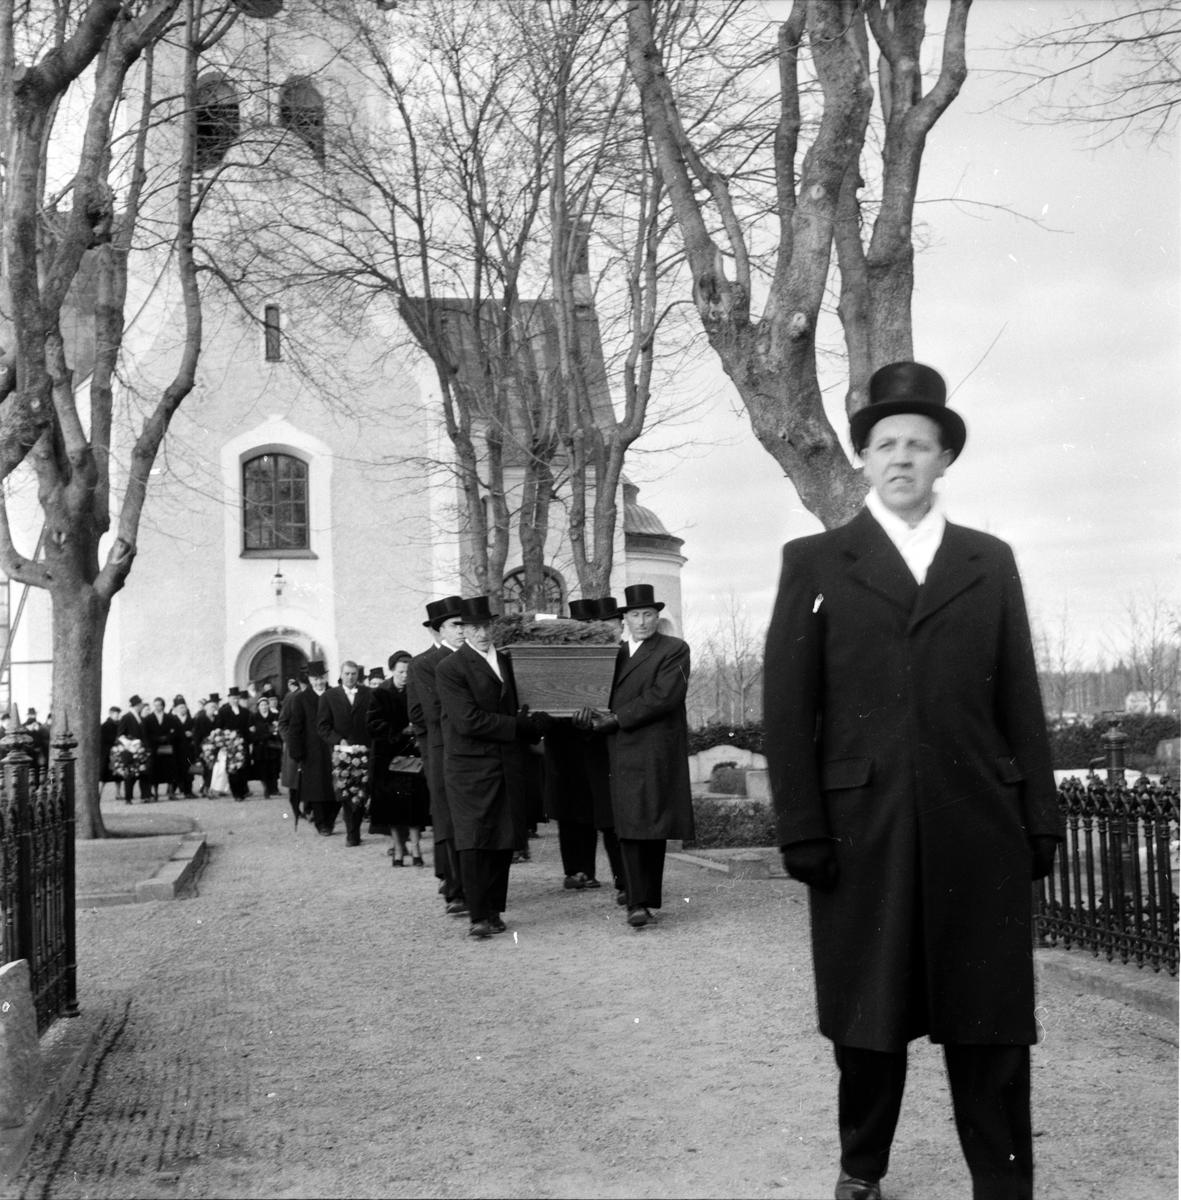 Granqvist David, prost, begravning, 1959